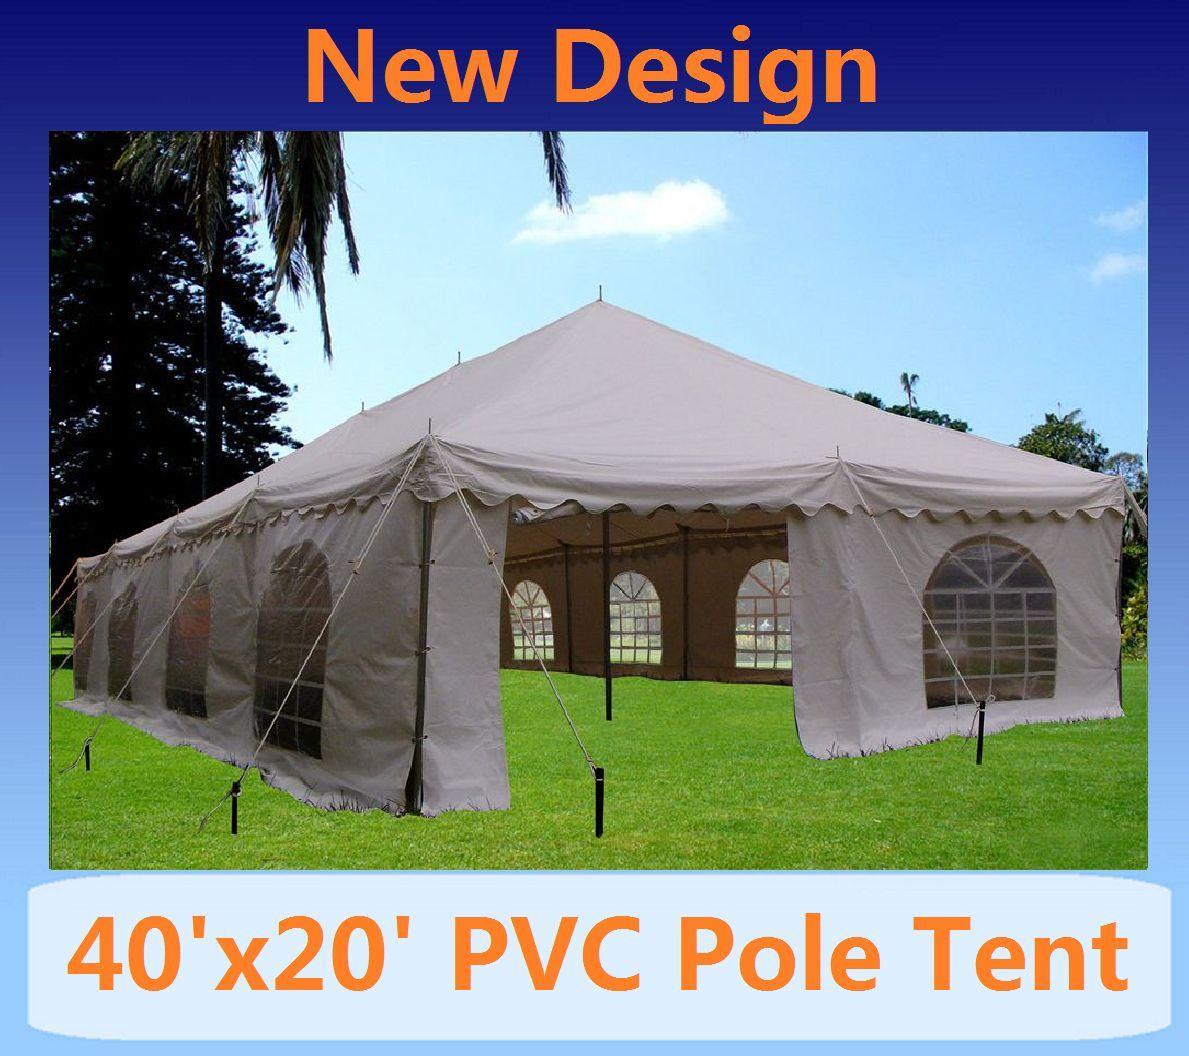 20 x 40 PVC Pole Tent Canopy & 20 x 40 PVC Pole Tent Canopy Gazebo -